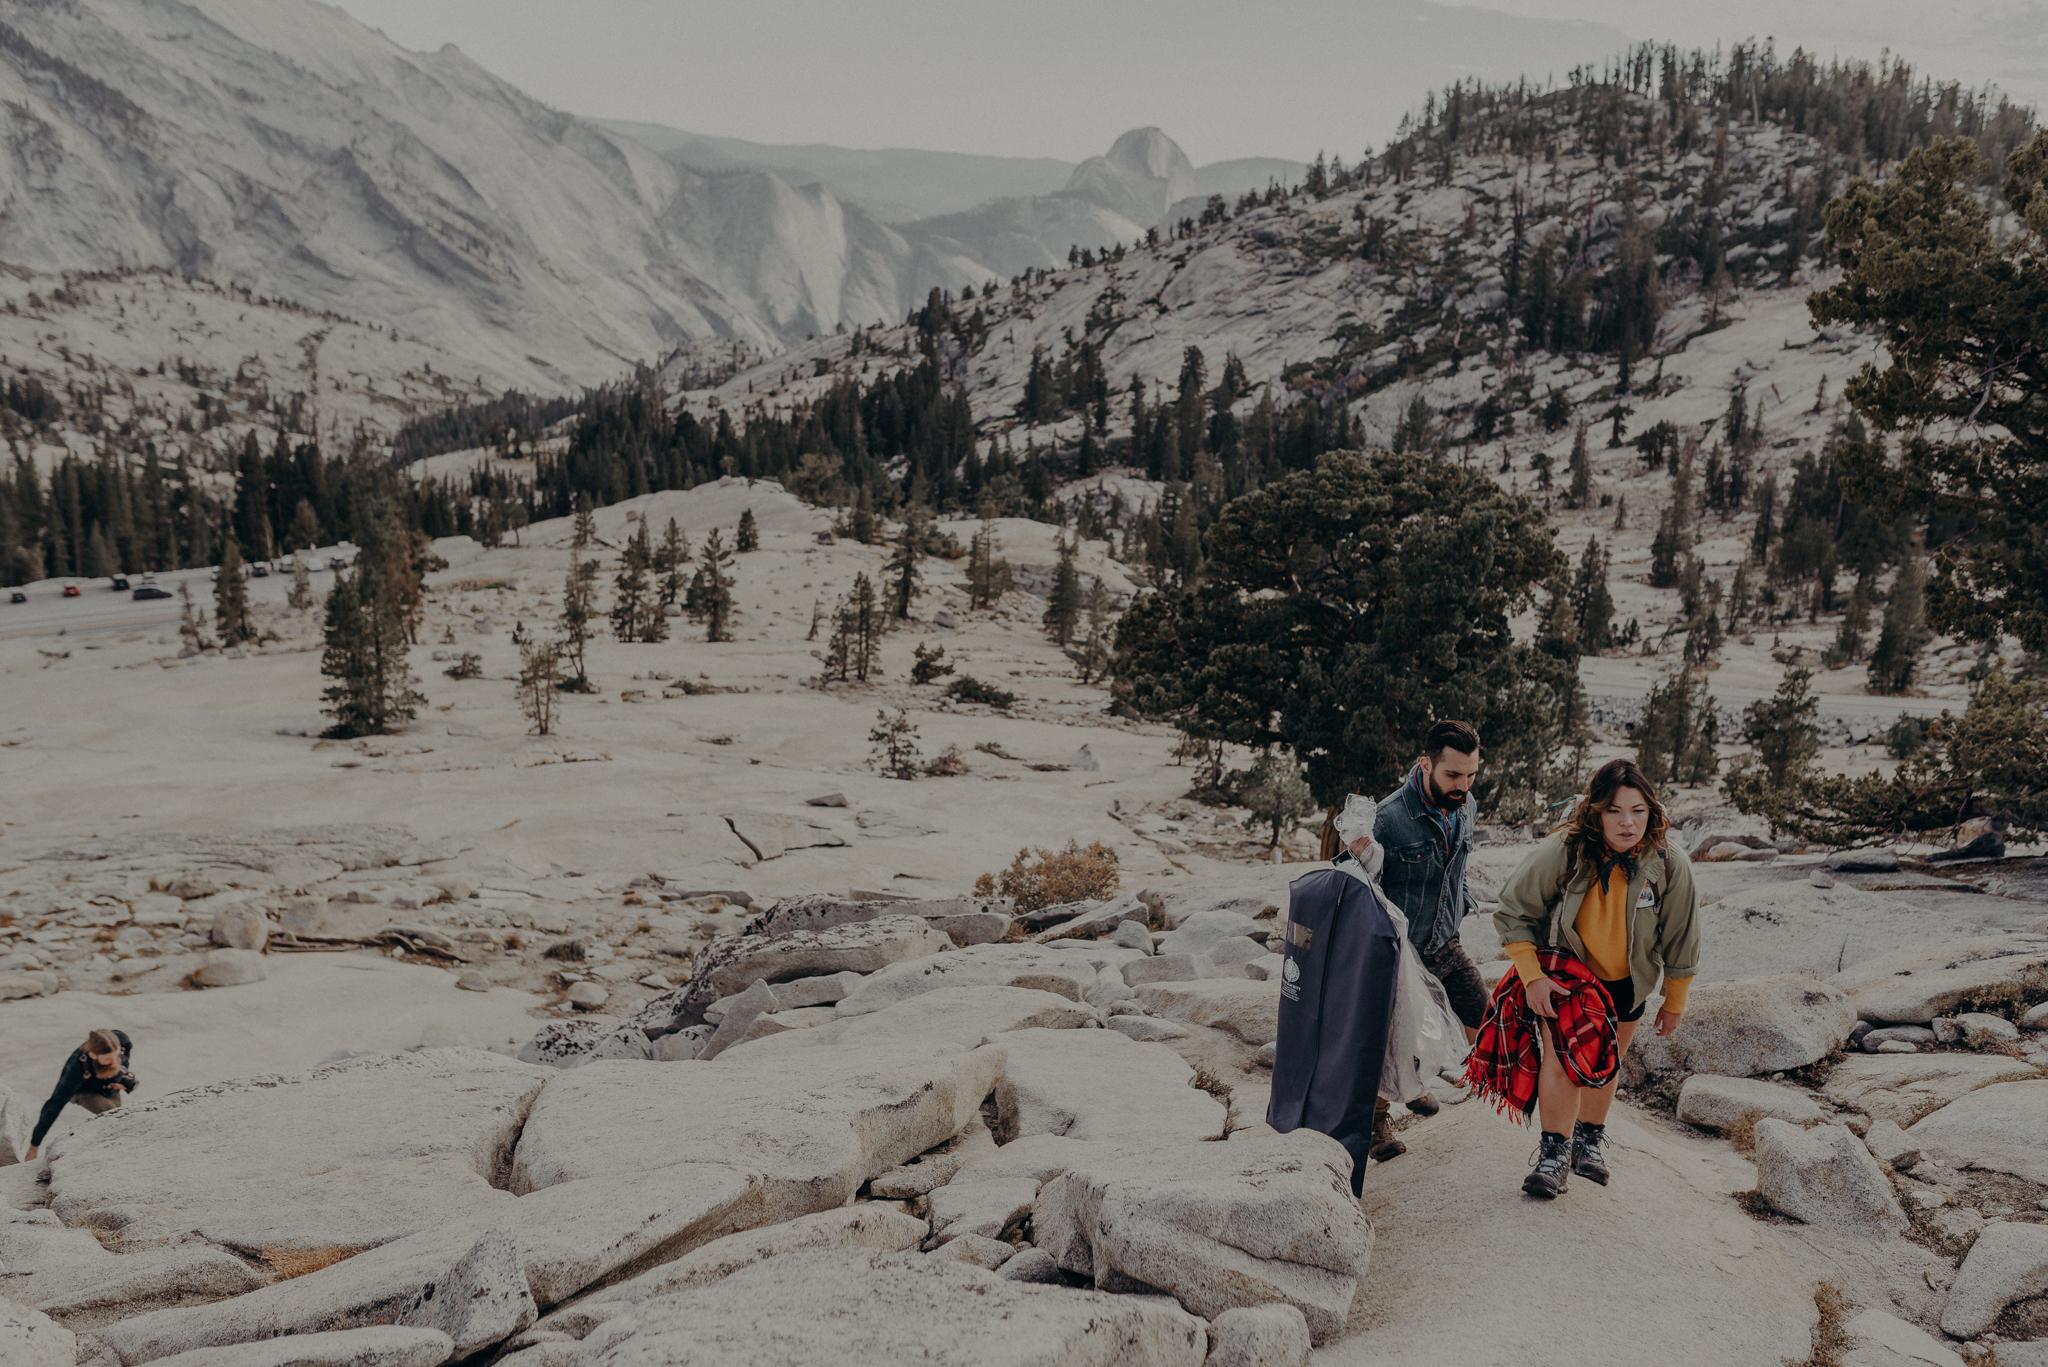 Yosemite Elopement Photographer - Evergreen Lodge Wedding Photographer - IsaiahAndTaylor.com-008.jpg